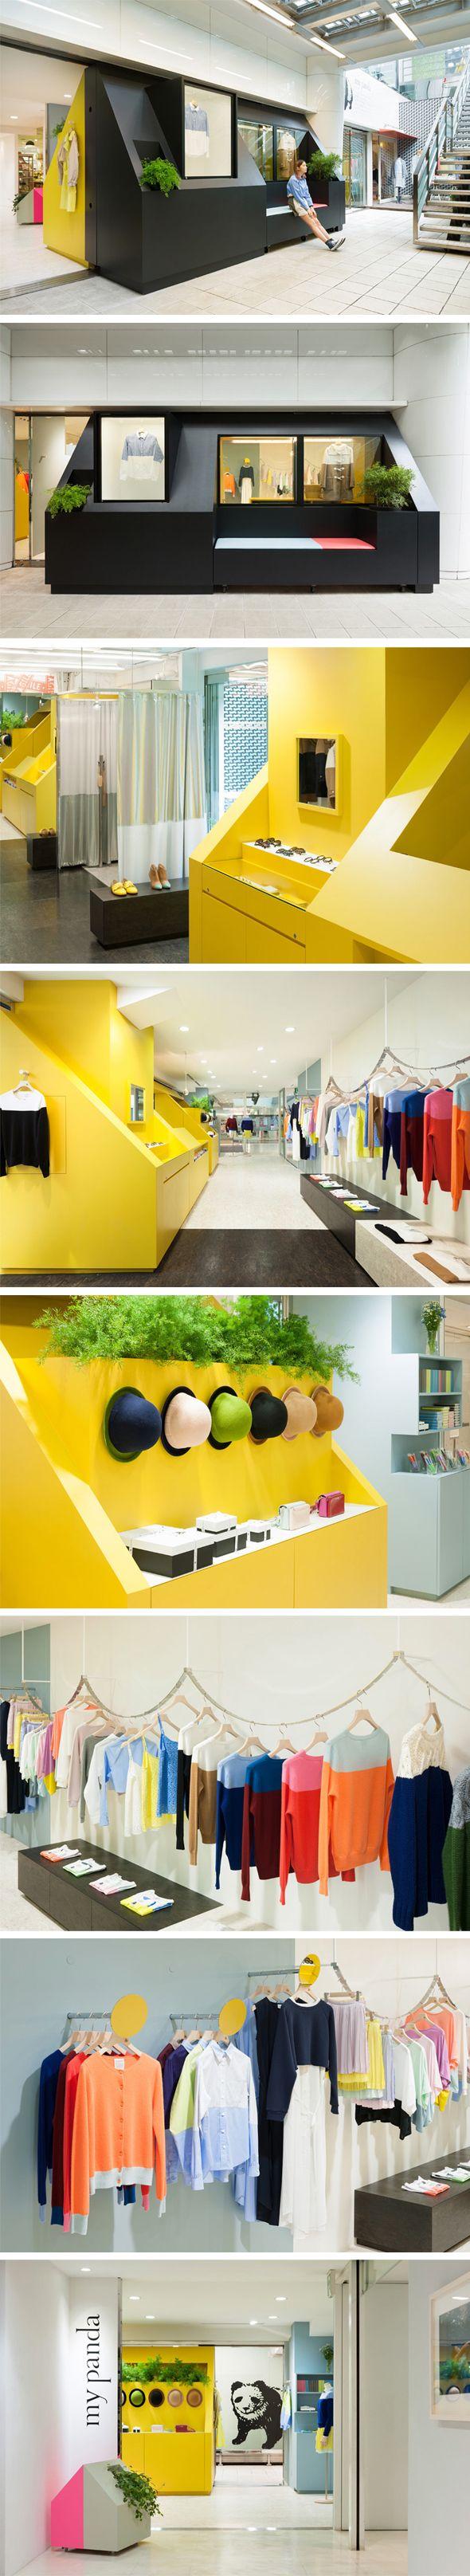 My Panda Retail Store par Torafu Architects